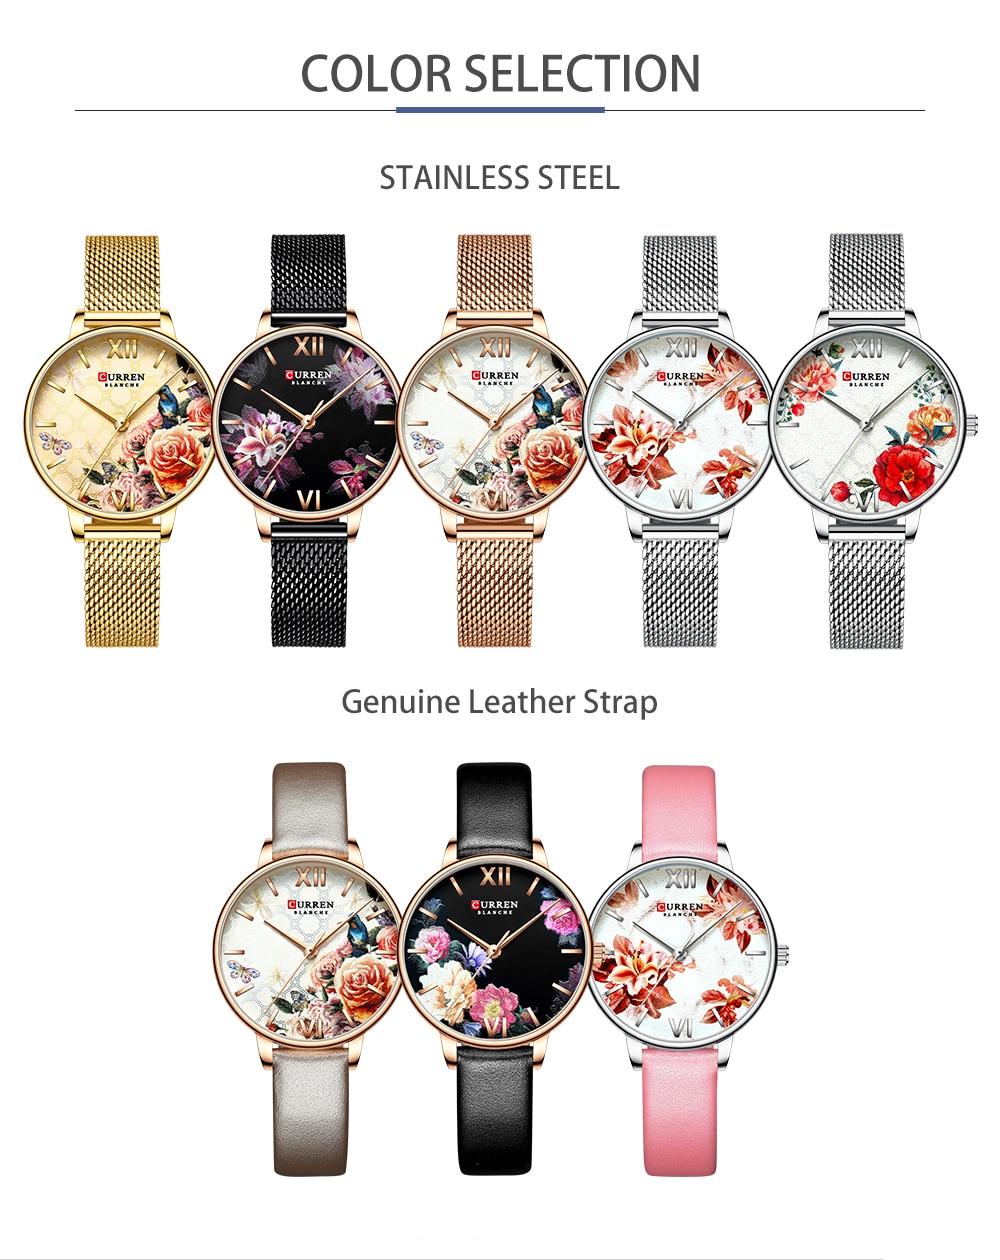 HTB1YQMCeBGE3KVjSZFhq6AkaFXaG CURREN Charming Flower Design Fashion